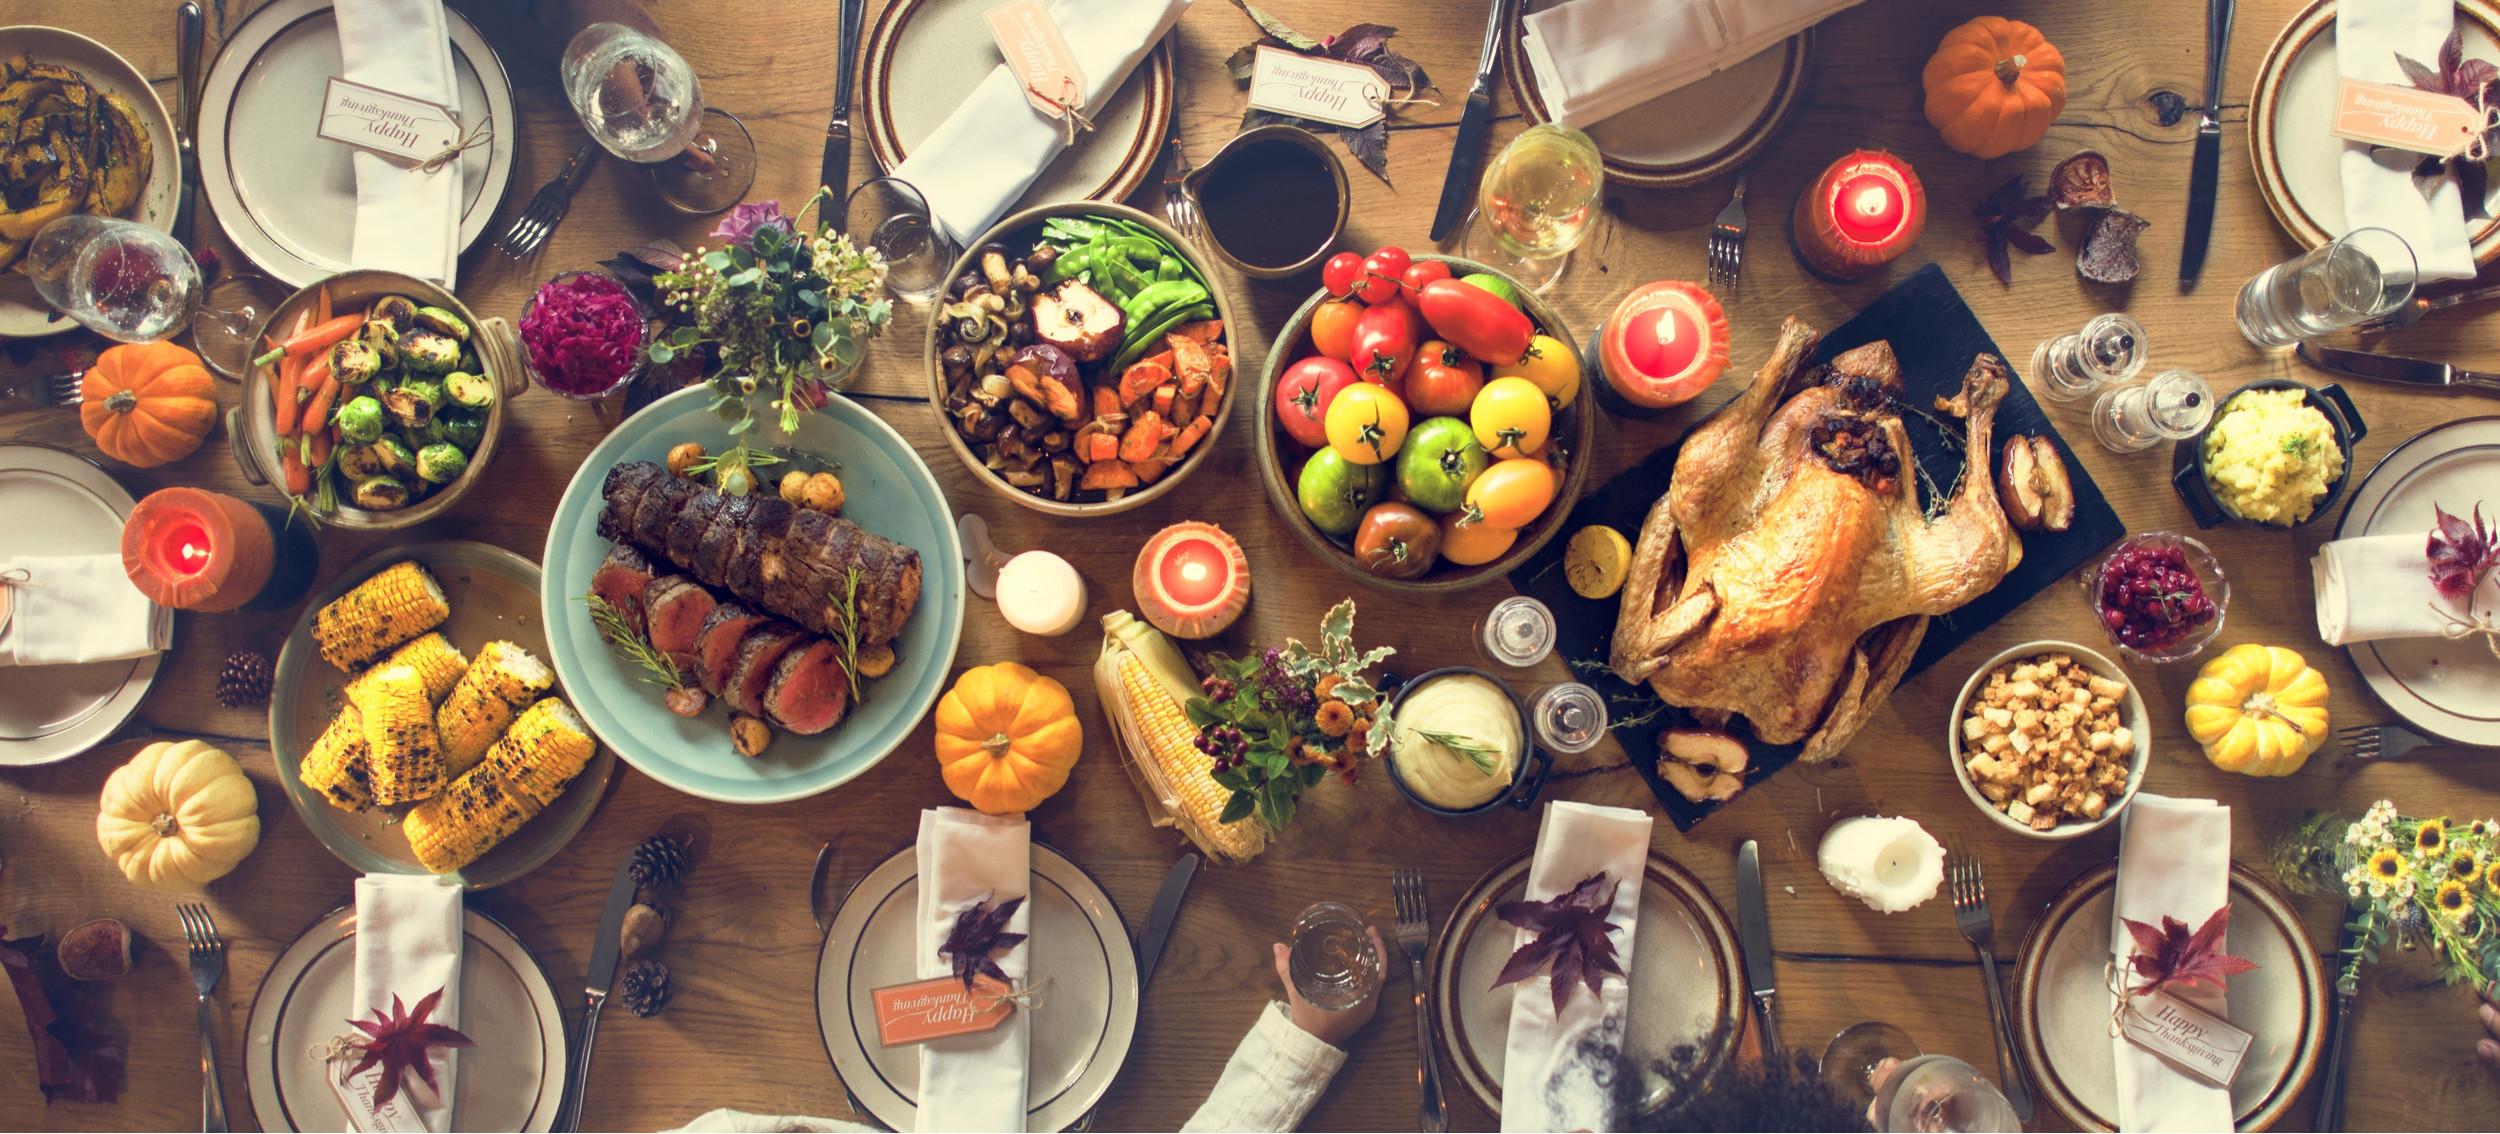 Thanksgiving Dinner San Diego  Thanksgiving Dinner in San Diego North County 2018